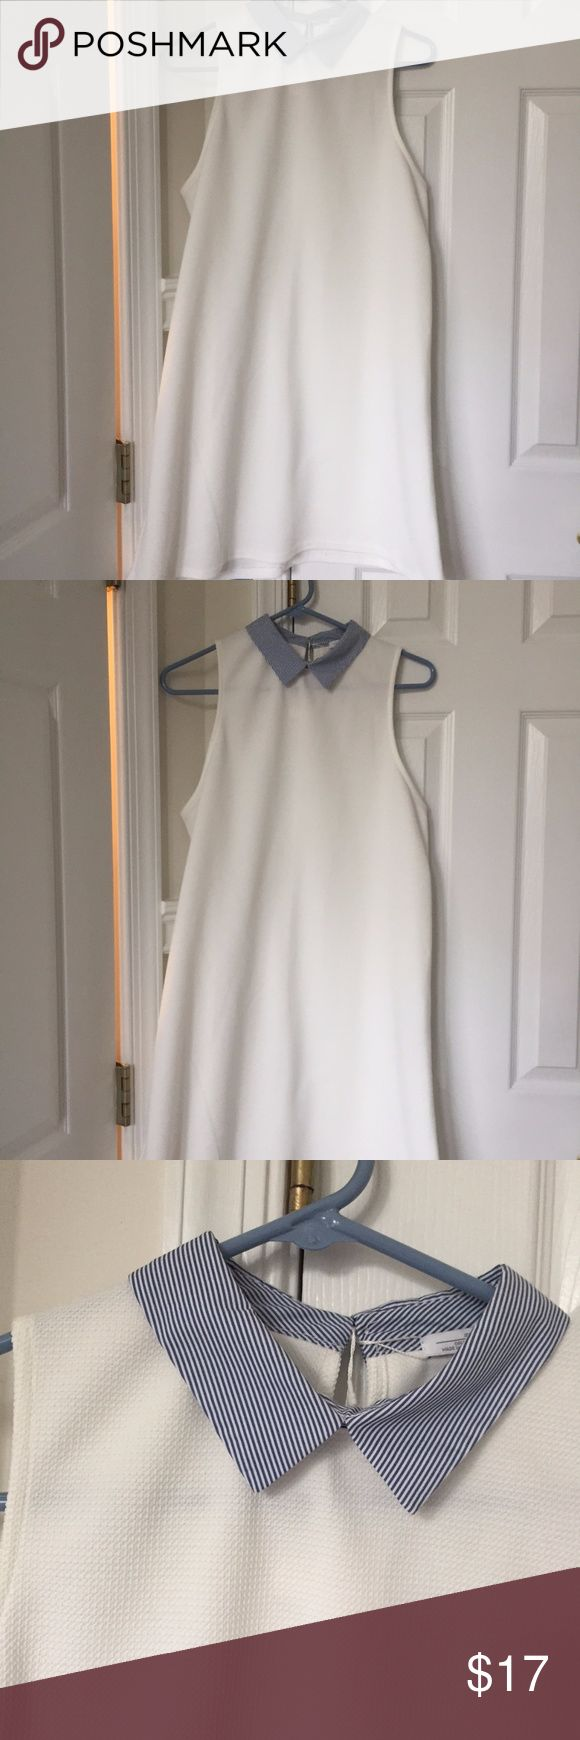 Zara White Collared Dress Preppy Tennis Cute BNWT Zara dress in a pique material with a sweet blue striped collar. A-line / trapeze silhouette,  size L. Zara Dresses Mini